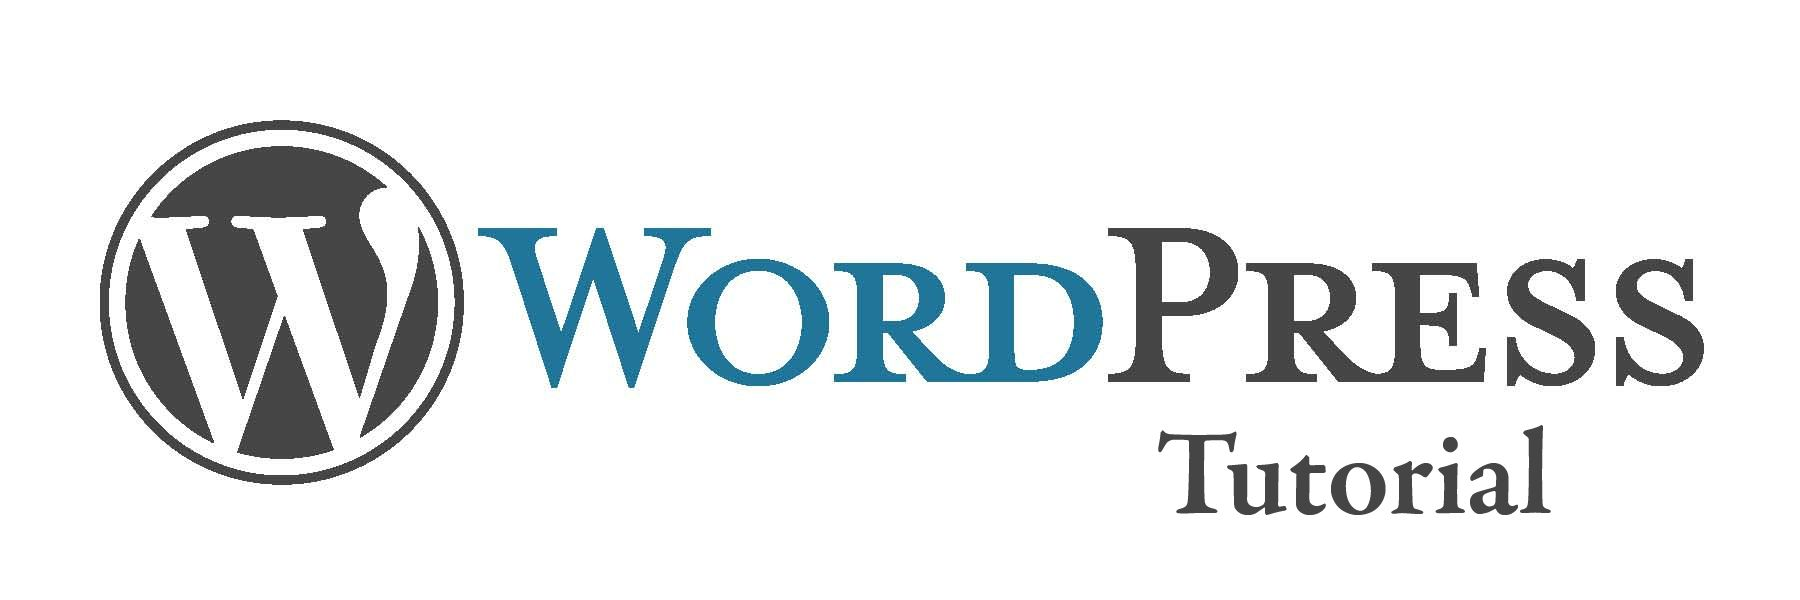 Image result for WordPress tutorials